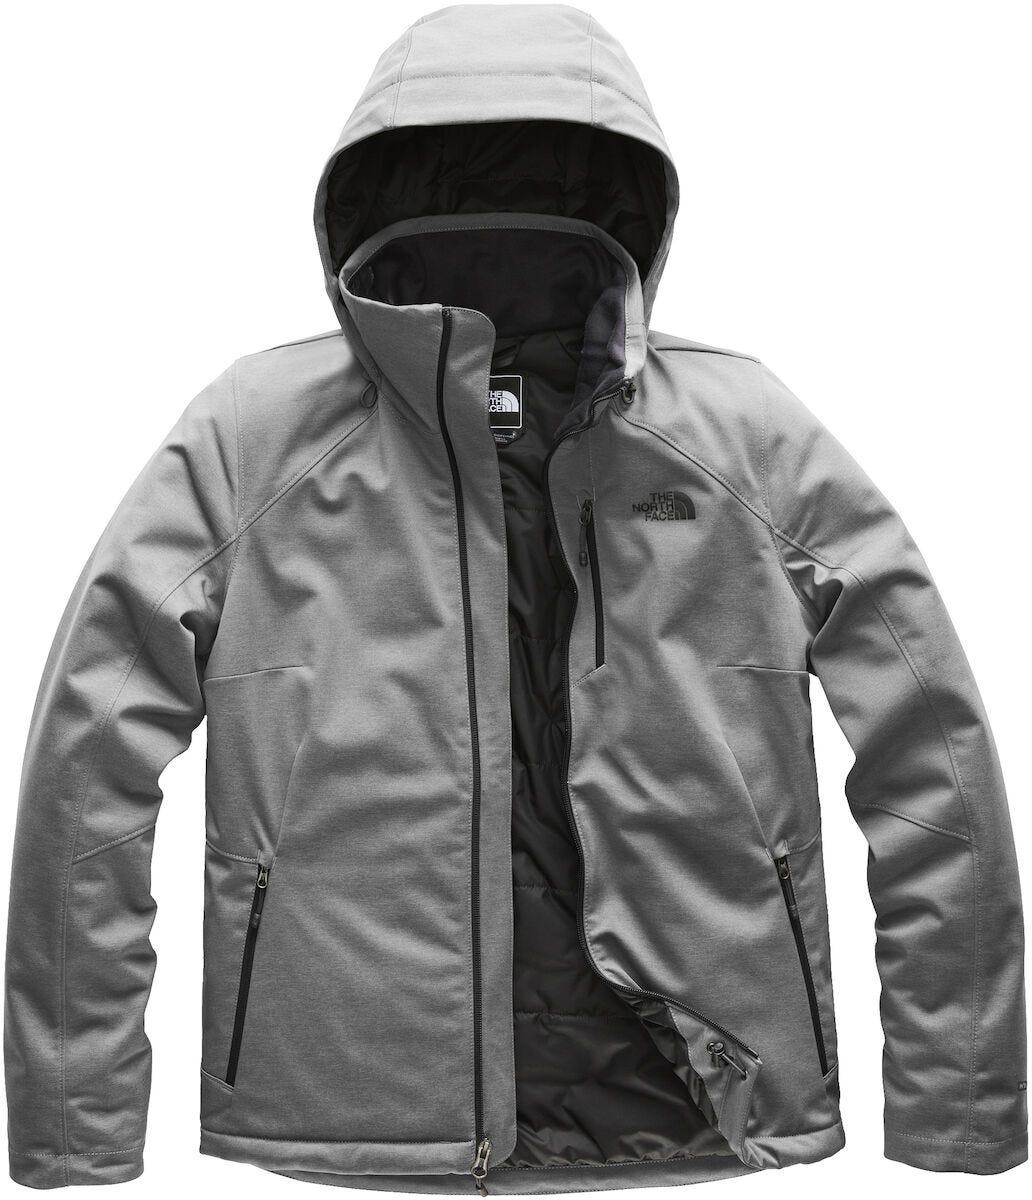 NWT Columbia Men/'s Big /& Tall Loma Vista Jacket Coat Winter Camp Trail Work